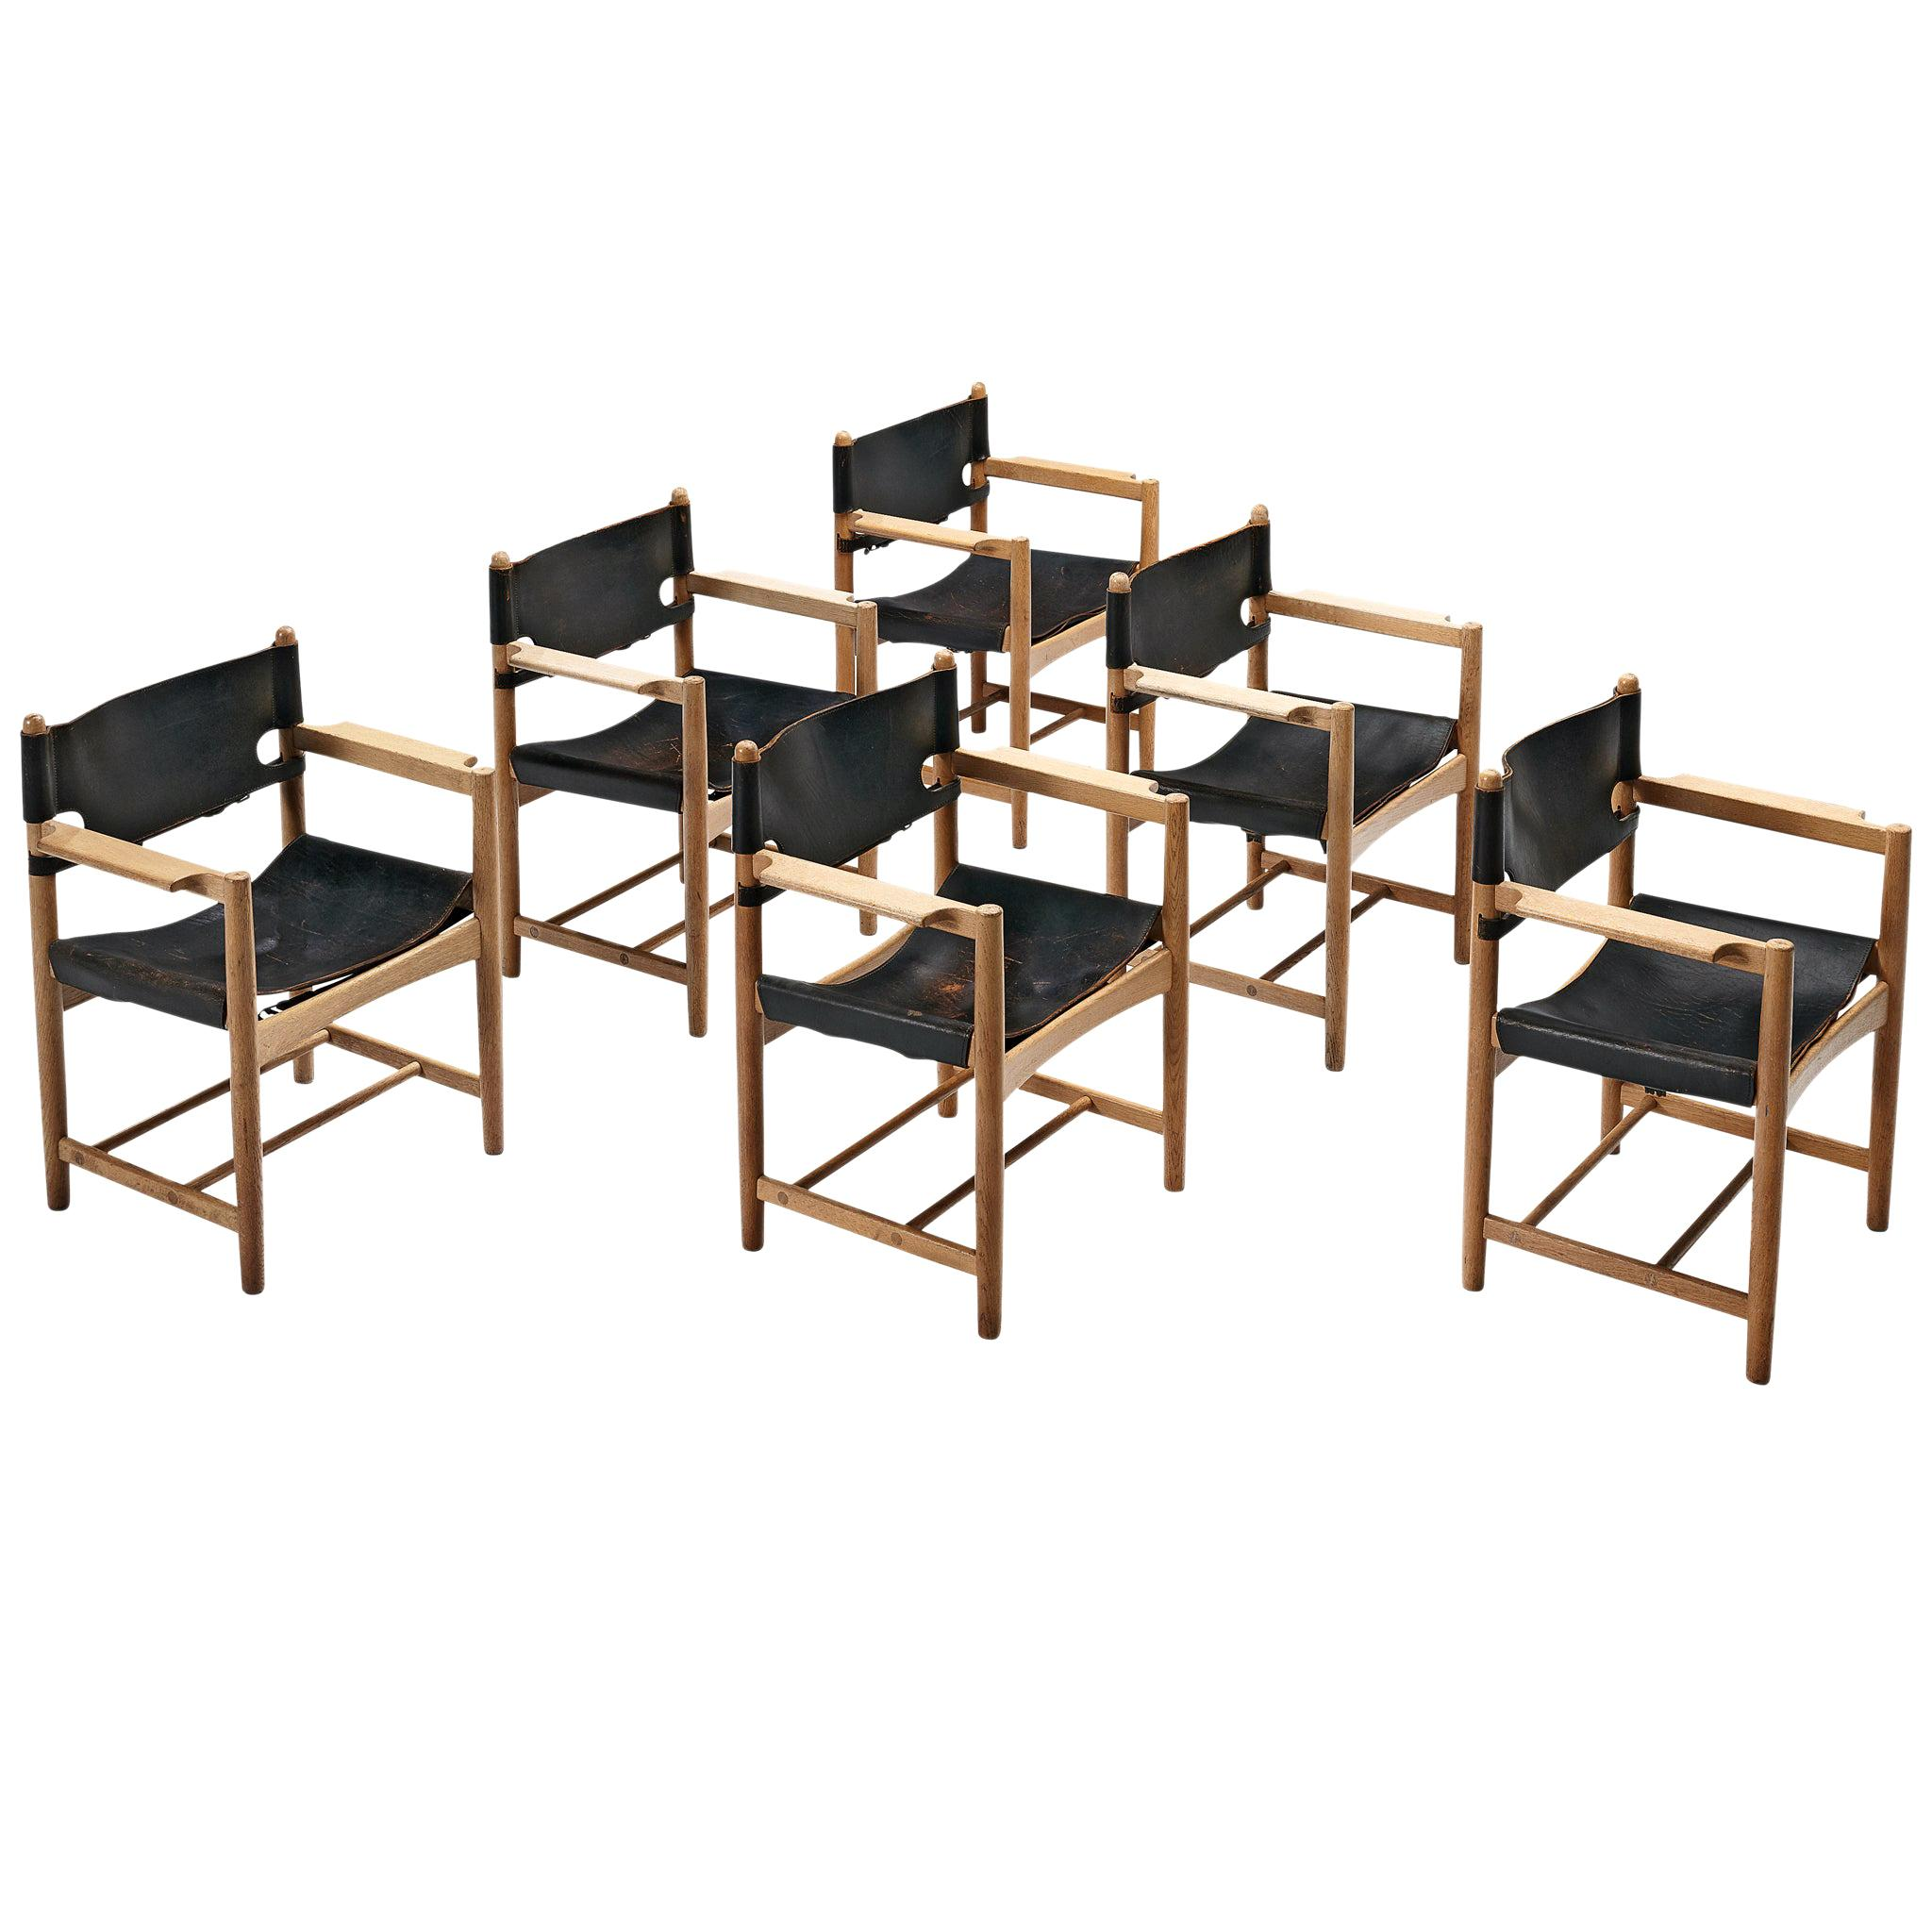 Børge Mogensen for Fredericia Stolefabrik Set of 'Spanish Dining Chairs'